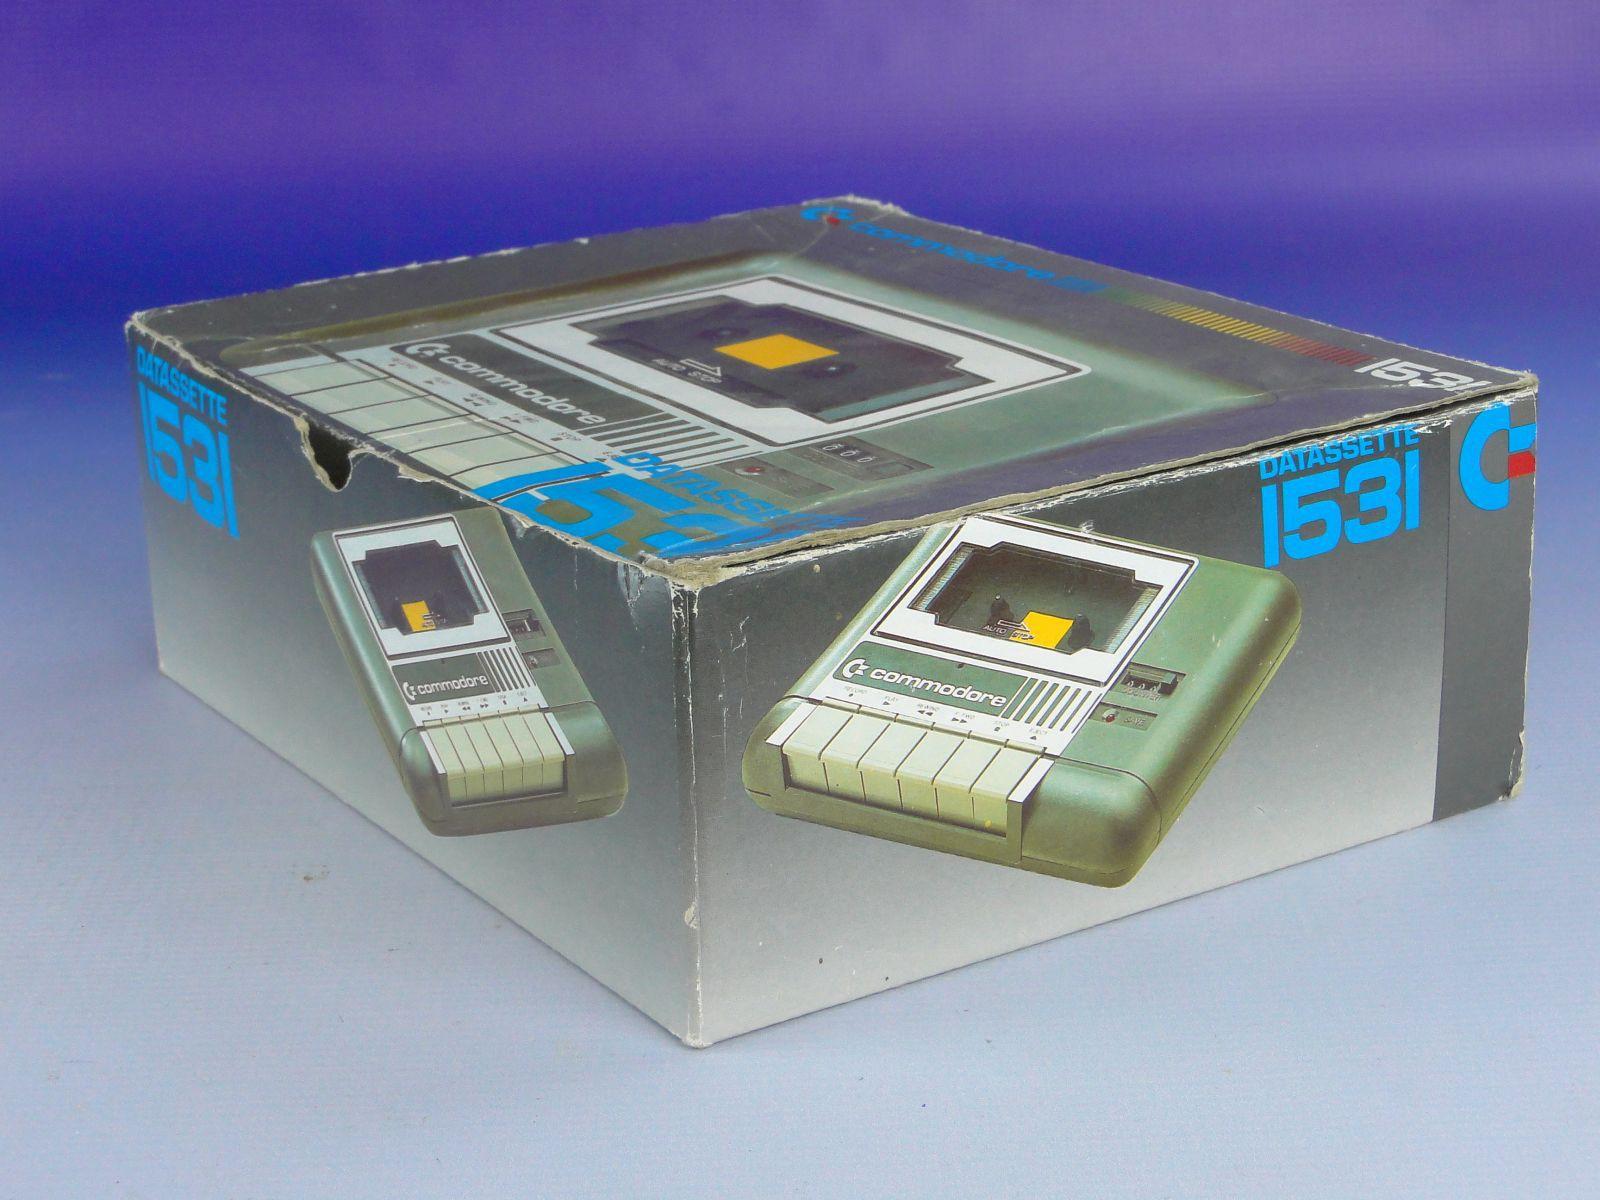 DSC09858.JPG (1600�1200)